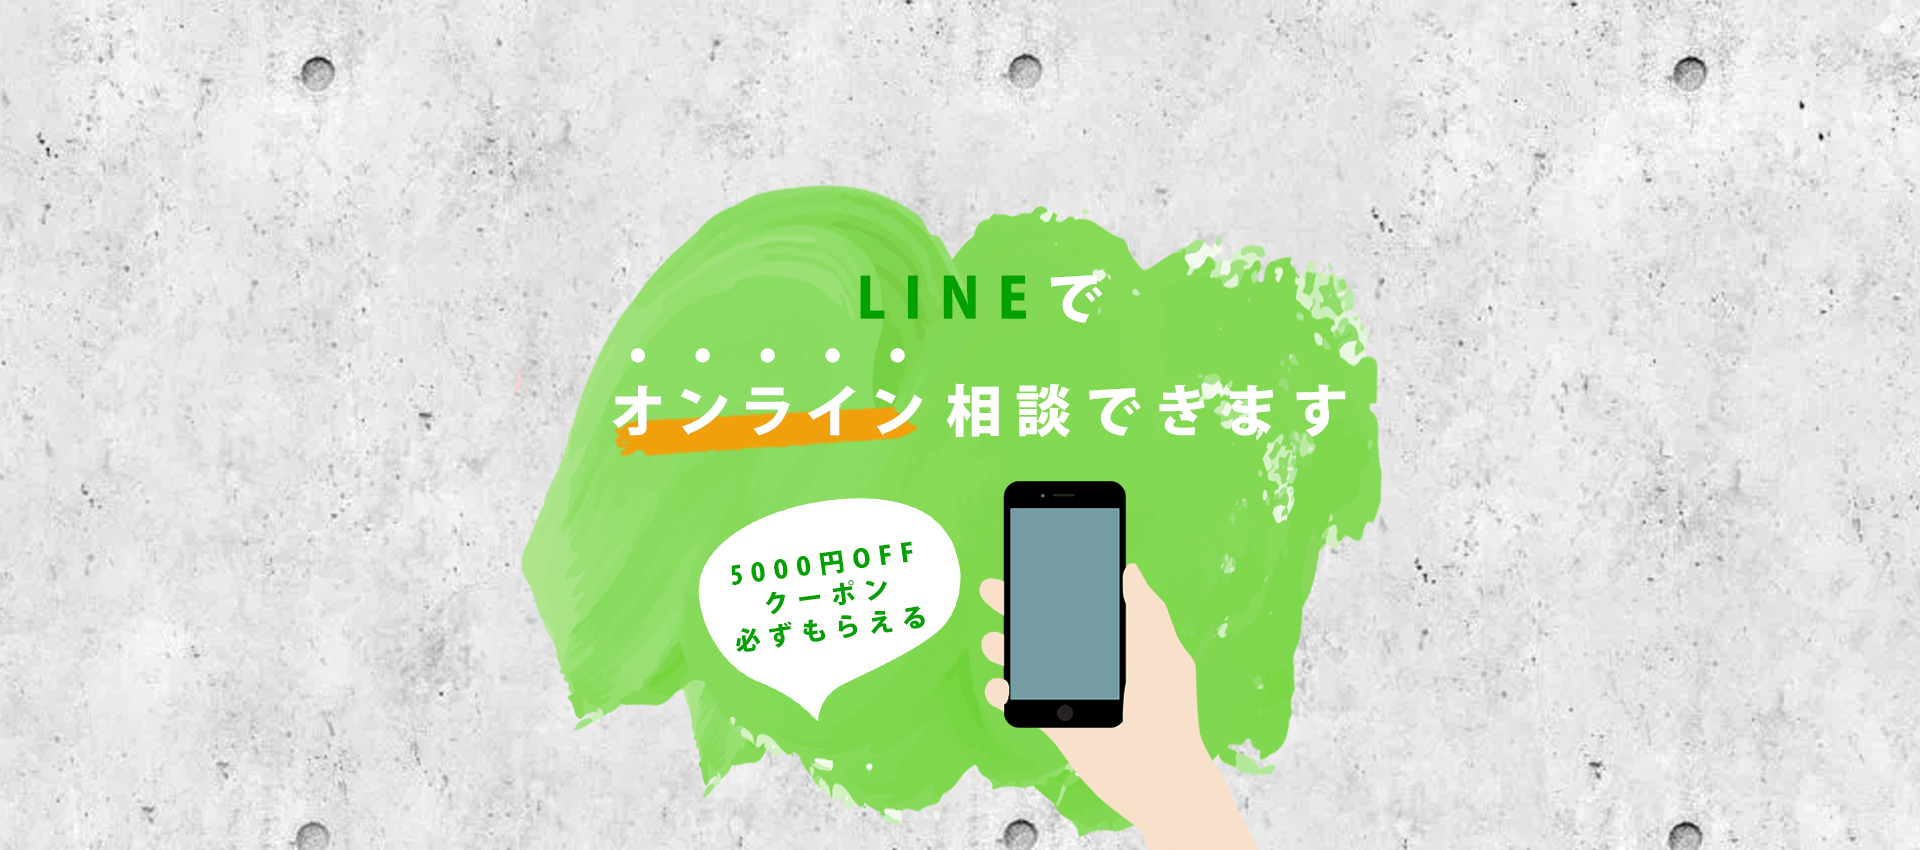 LINEオンライン相談